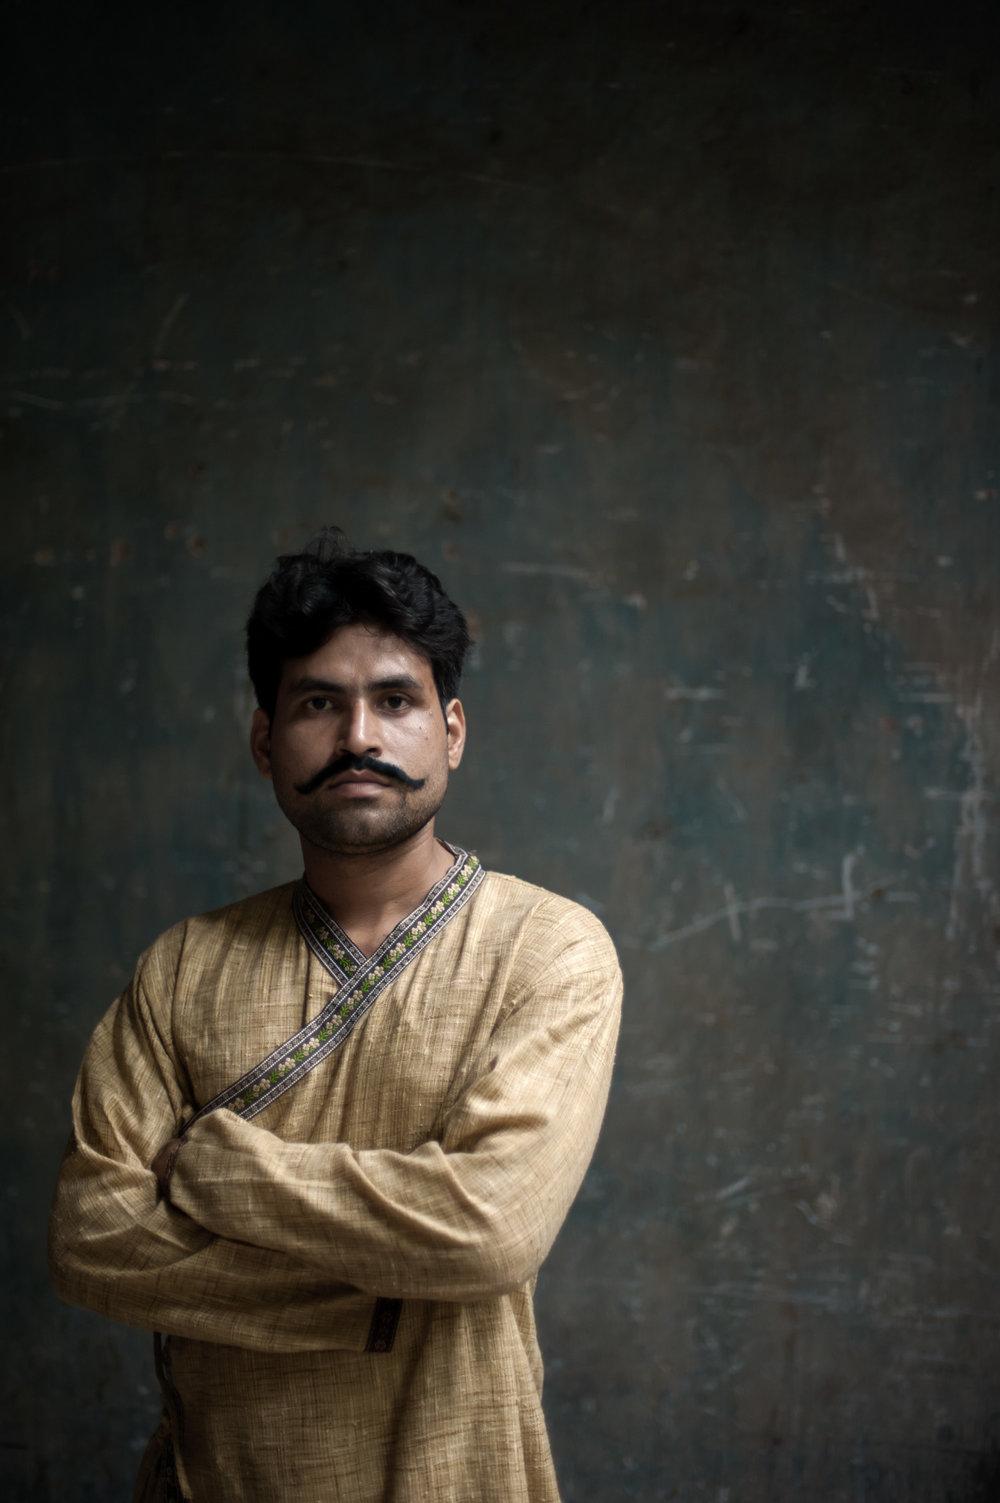 8_Chhandak Pradhan-fashion-Ruins and a Requiem-vintage_feudal_Indian_royal_portrait.jpg